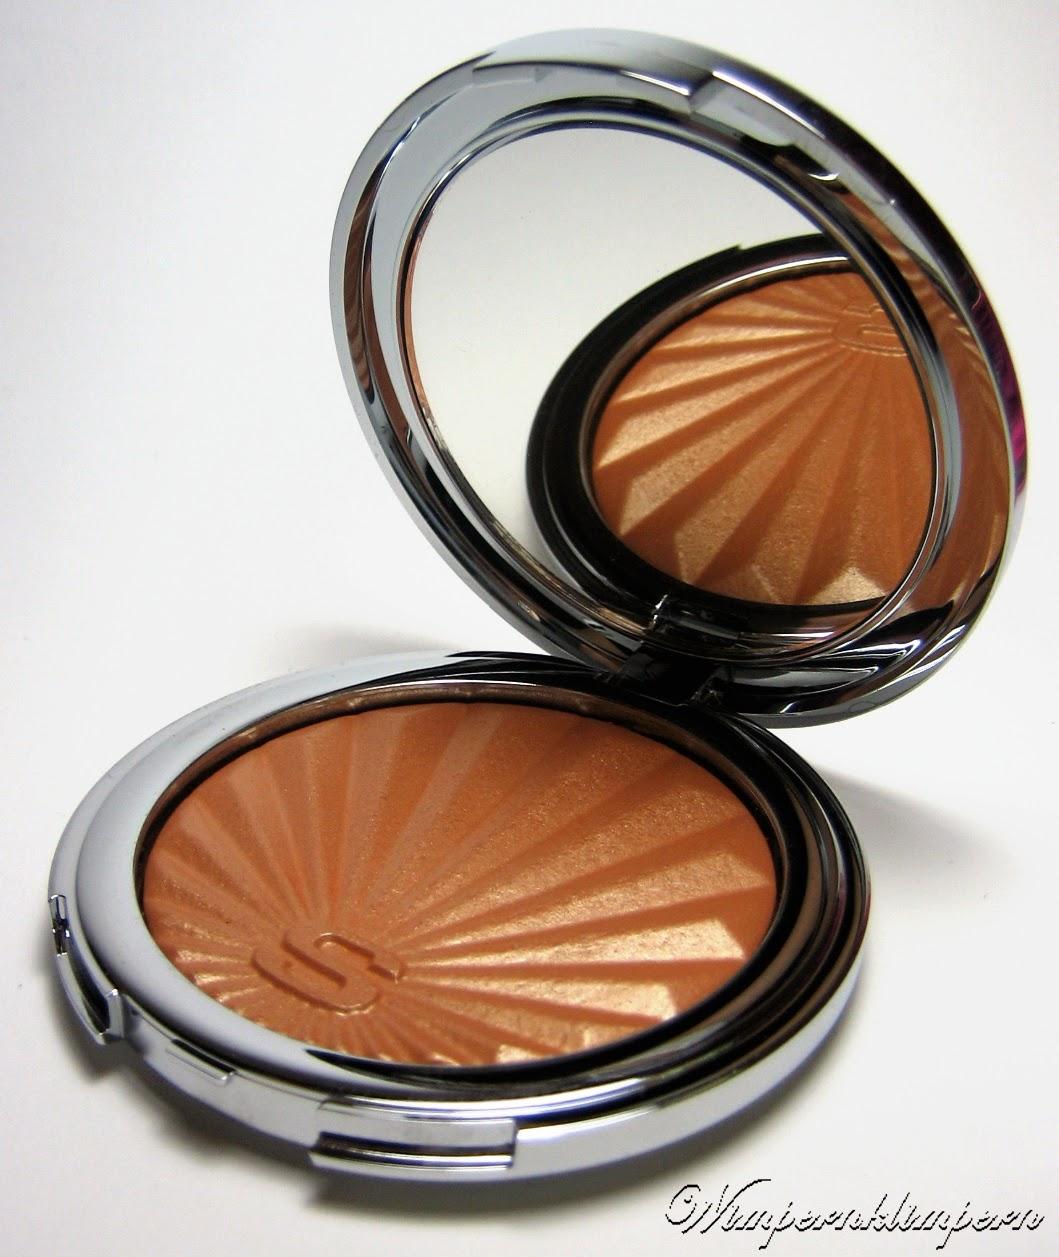 Produkt Spiegel